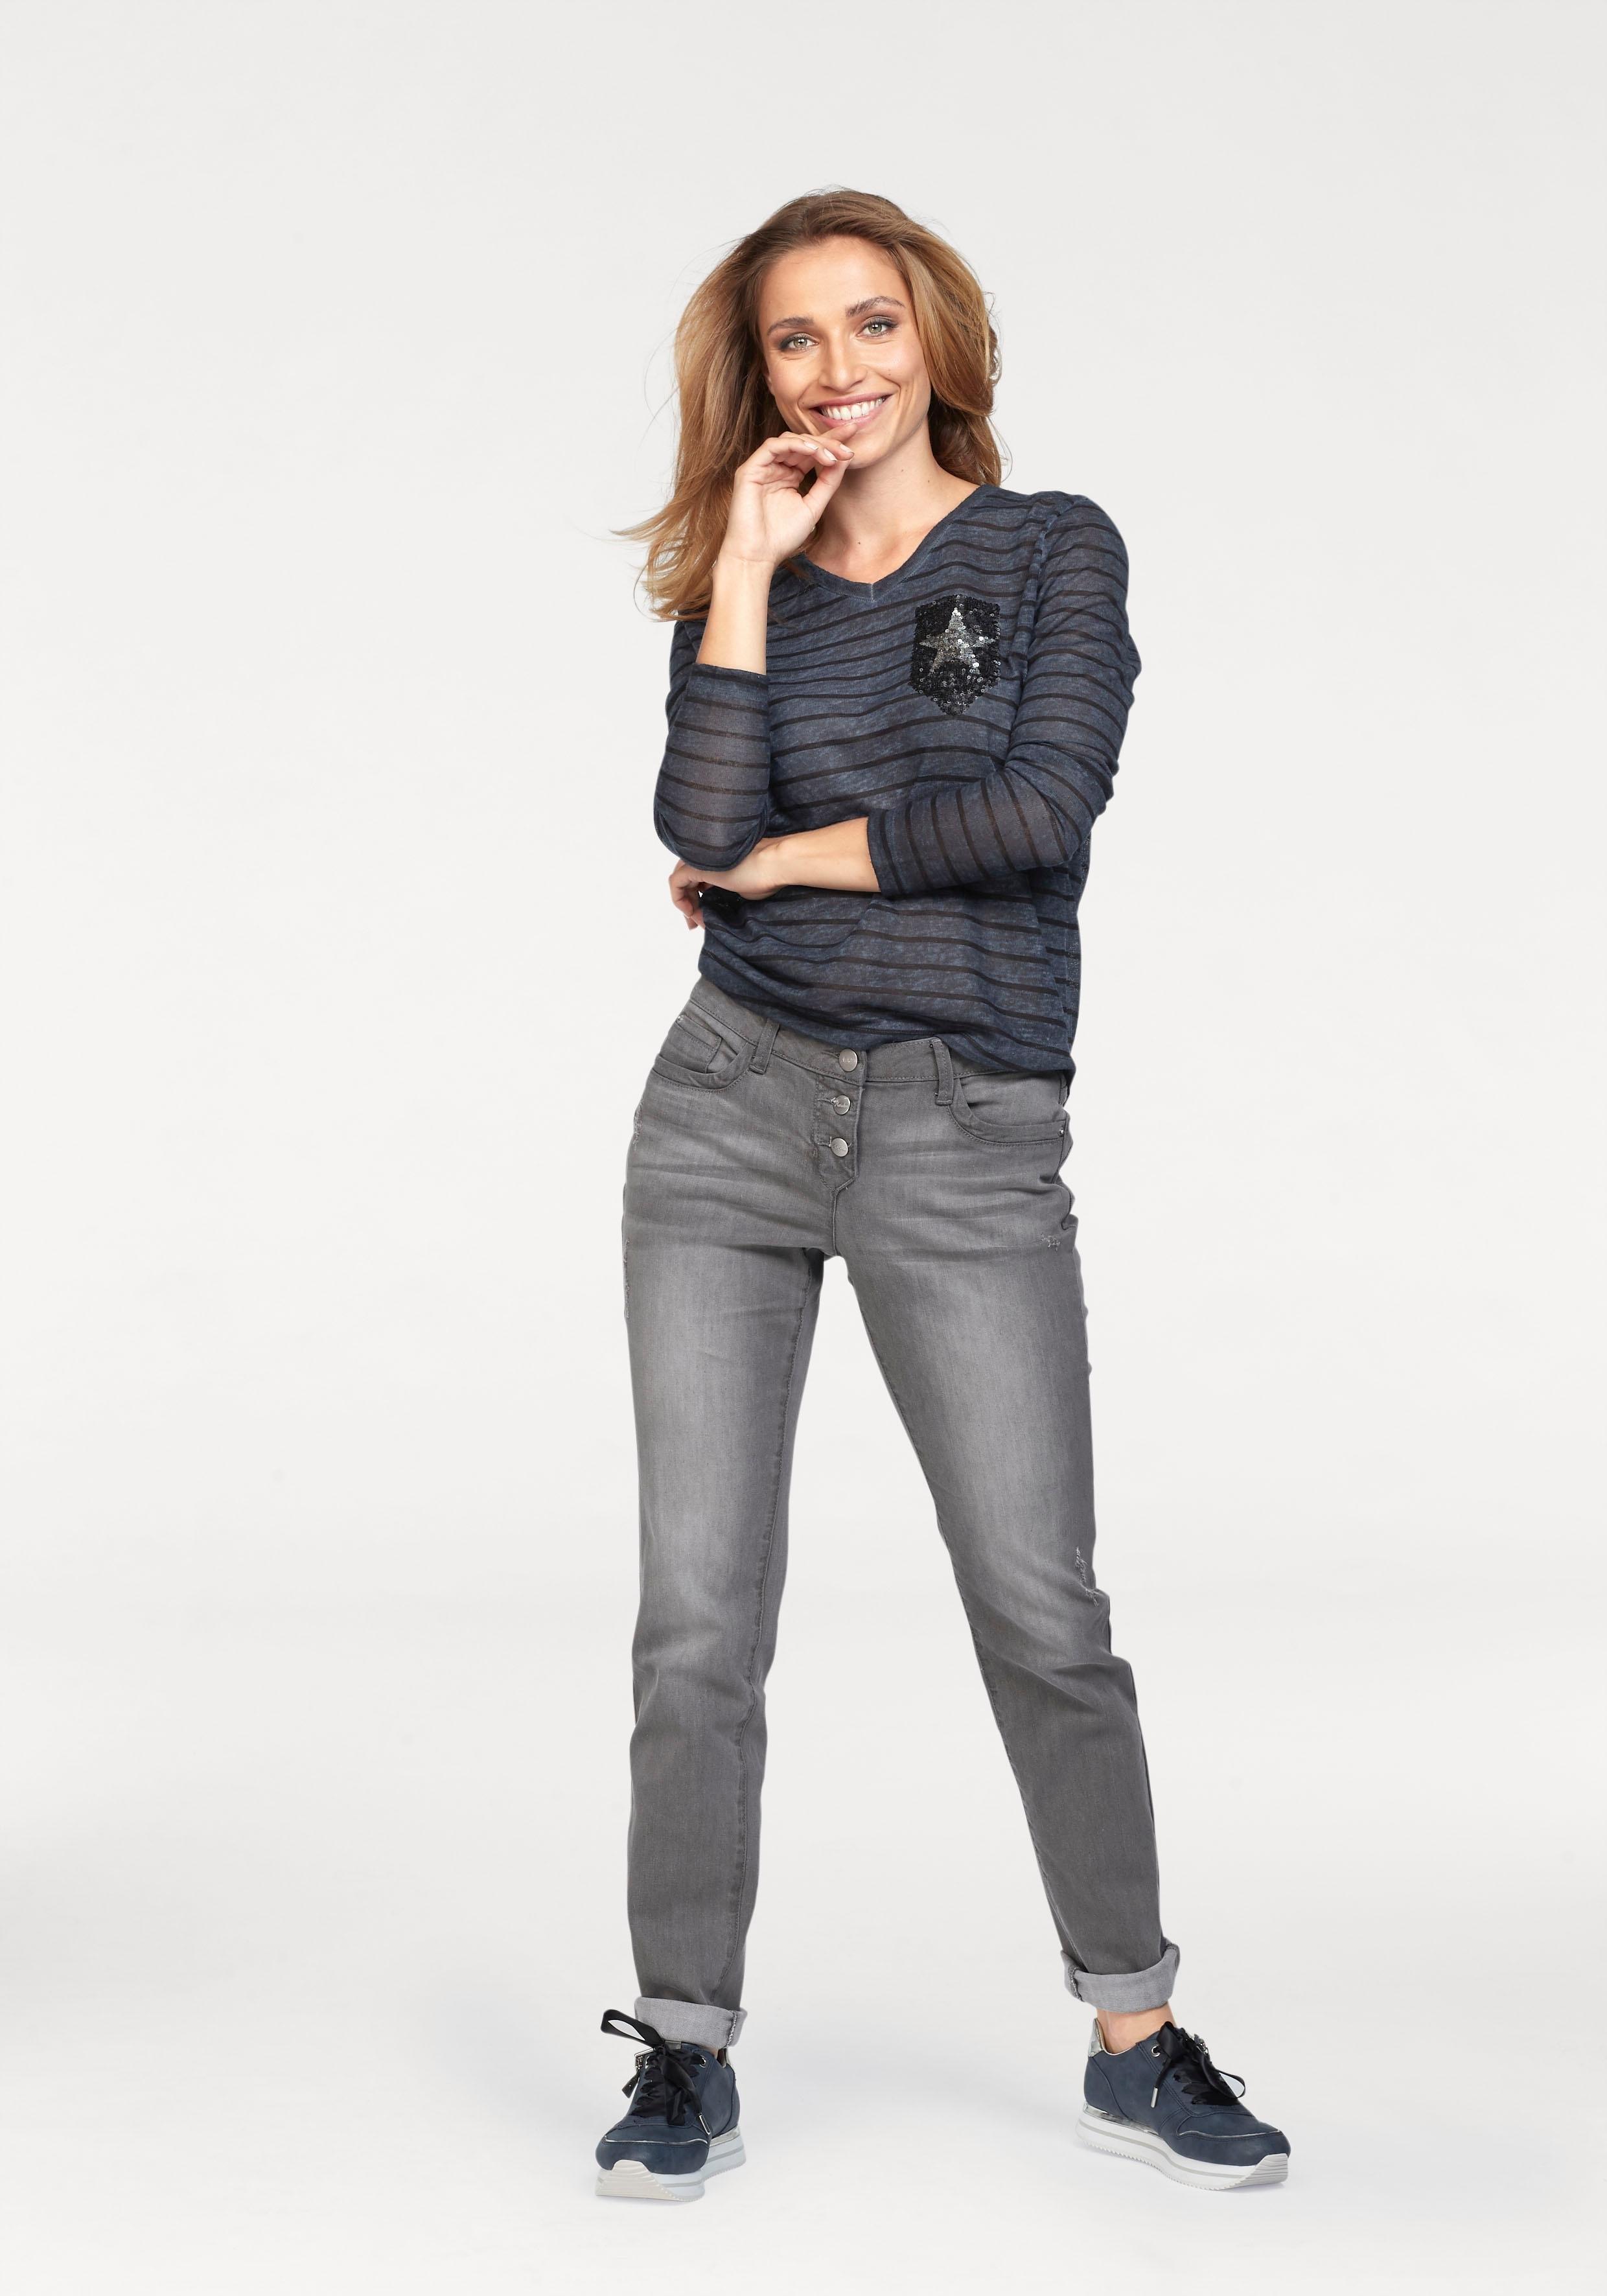 Online Lange Met Verkrijgbaar Shirt Aniston Mouwen N08nwm